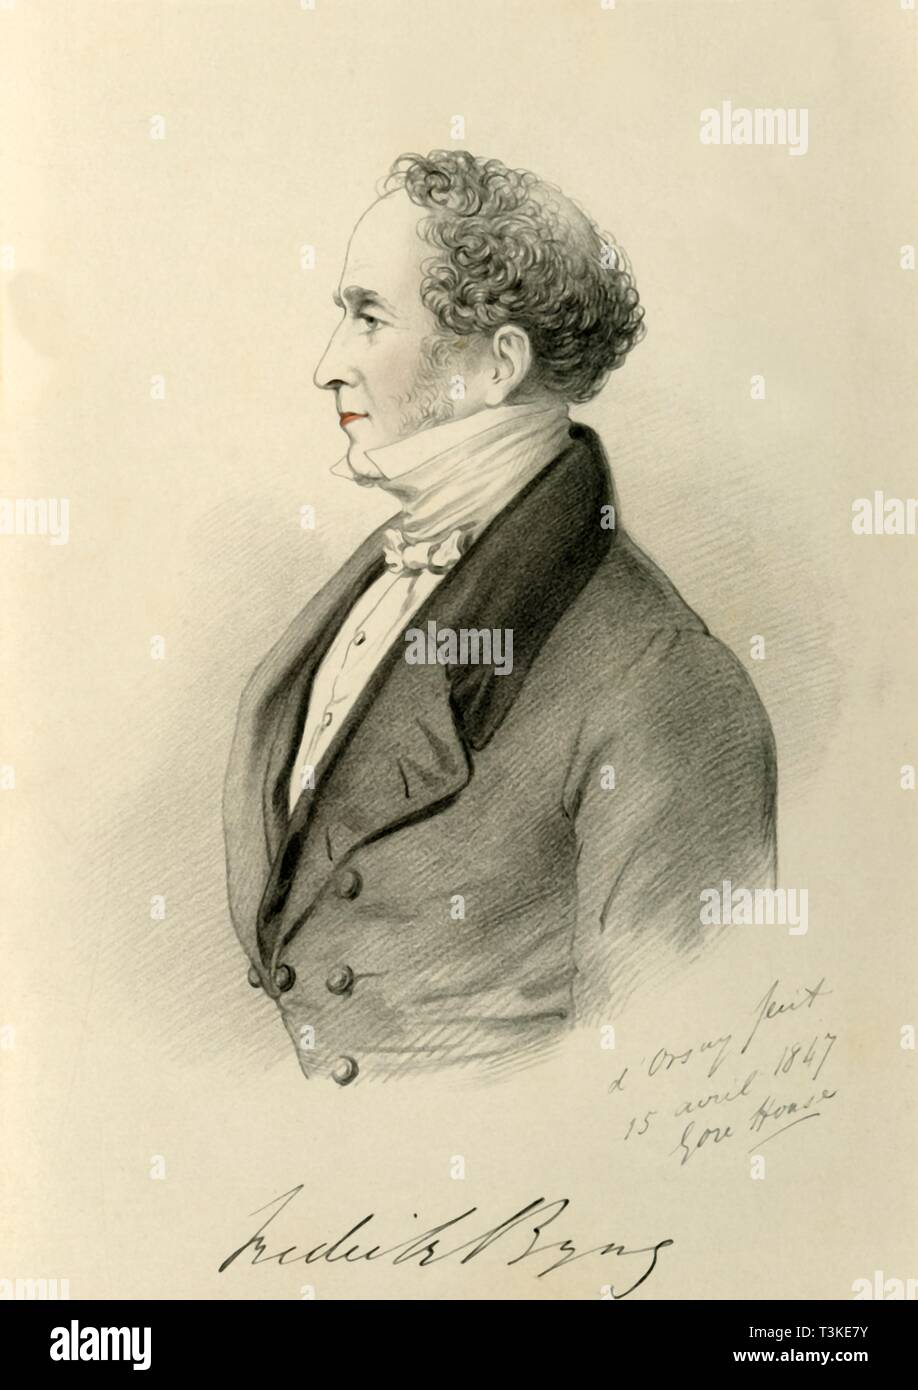 'Frederick Byng', 1847. Creators: Alfred d'Orsay, Richard James Lane. - Stock Image